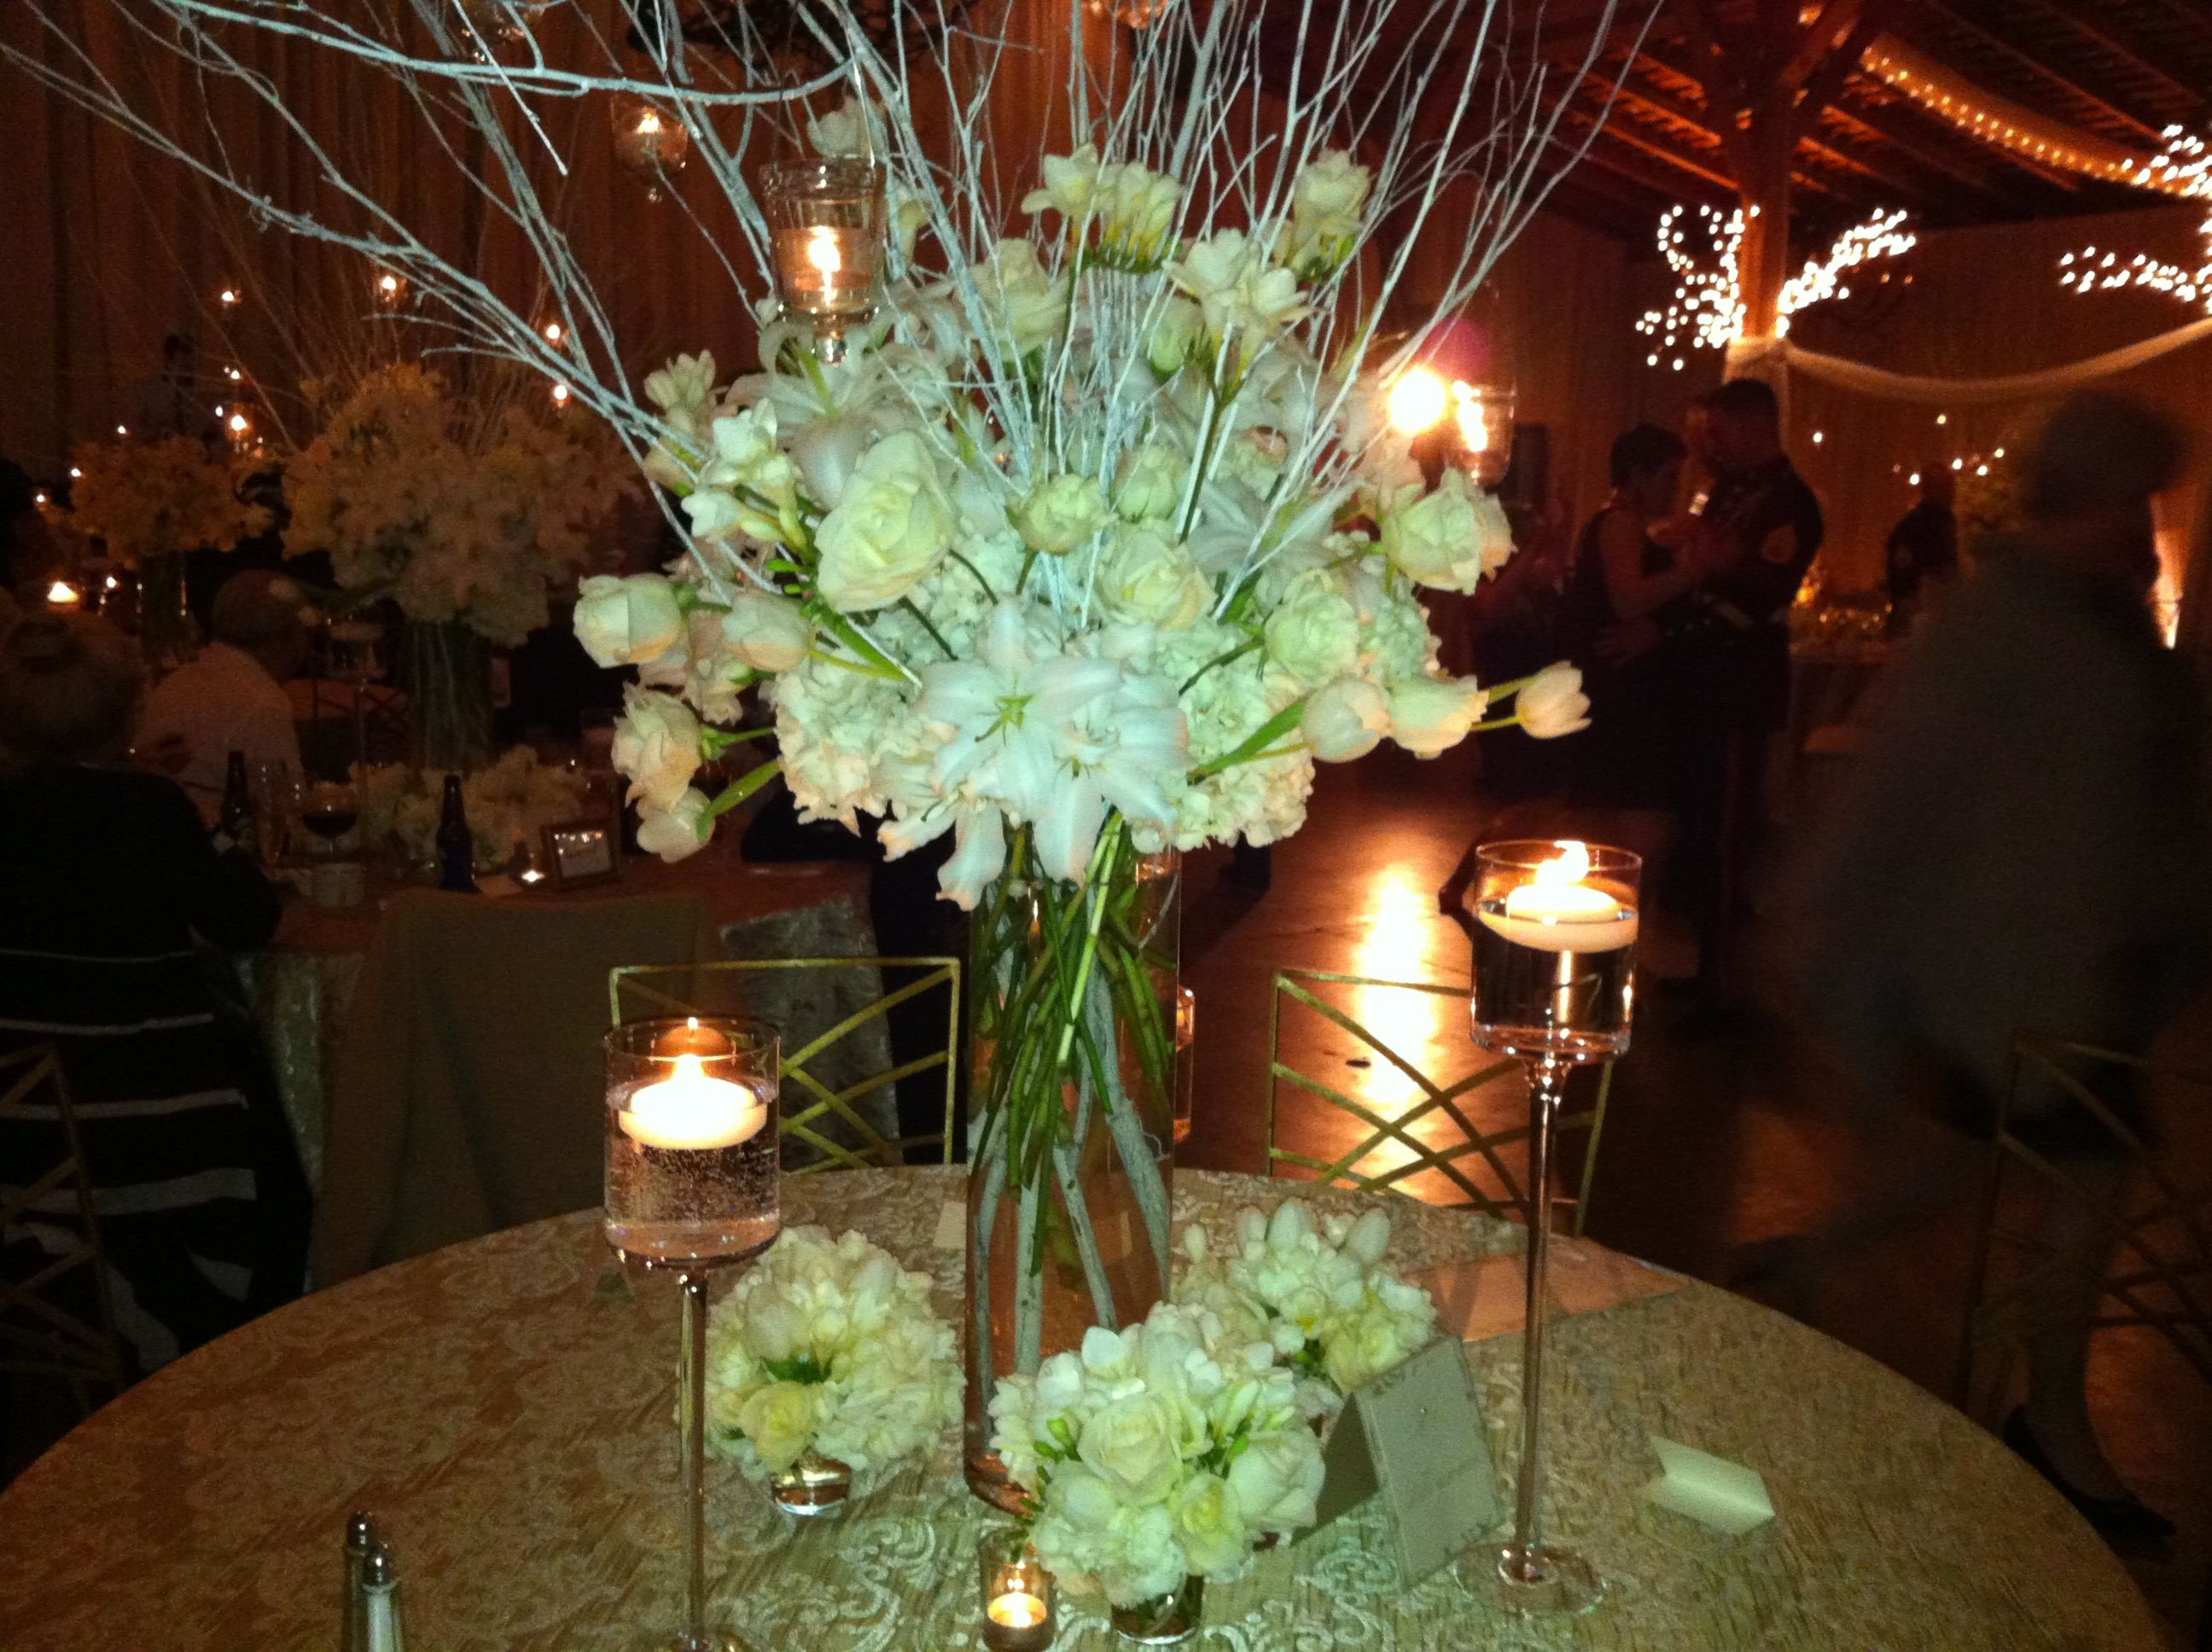 February Wedding Centerpieces Wedding Ideas